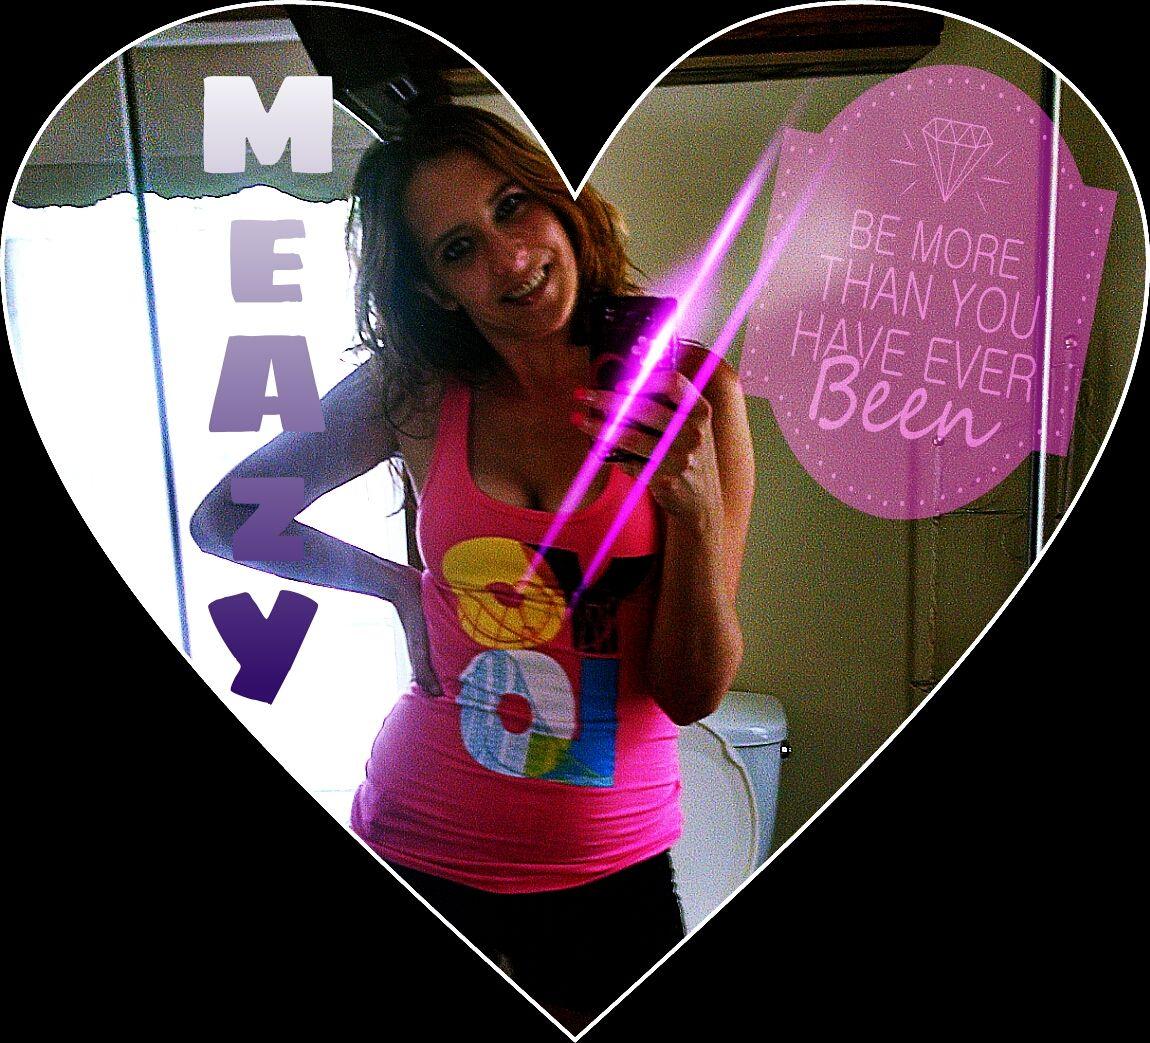 MELISSA... AKA.... Meazmusicblogger